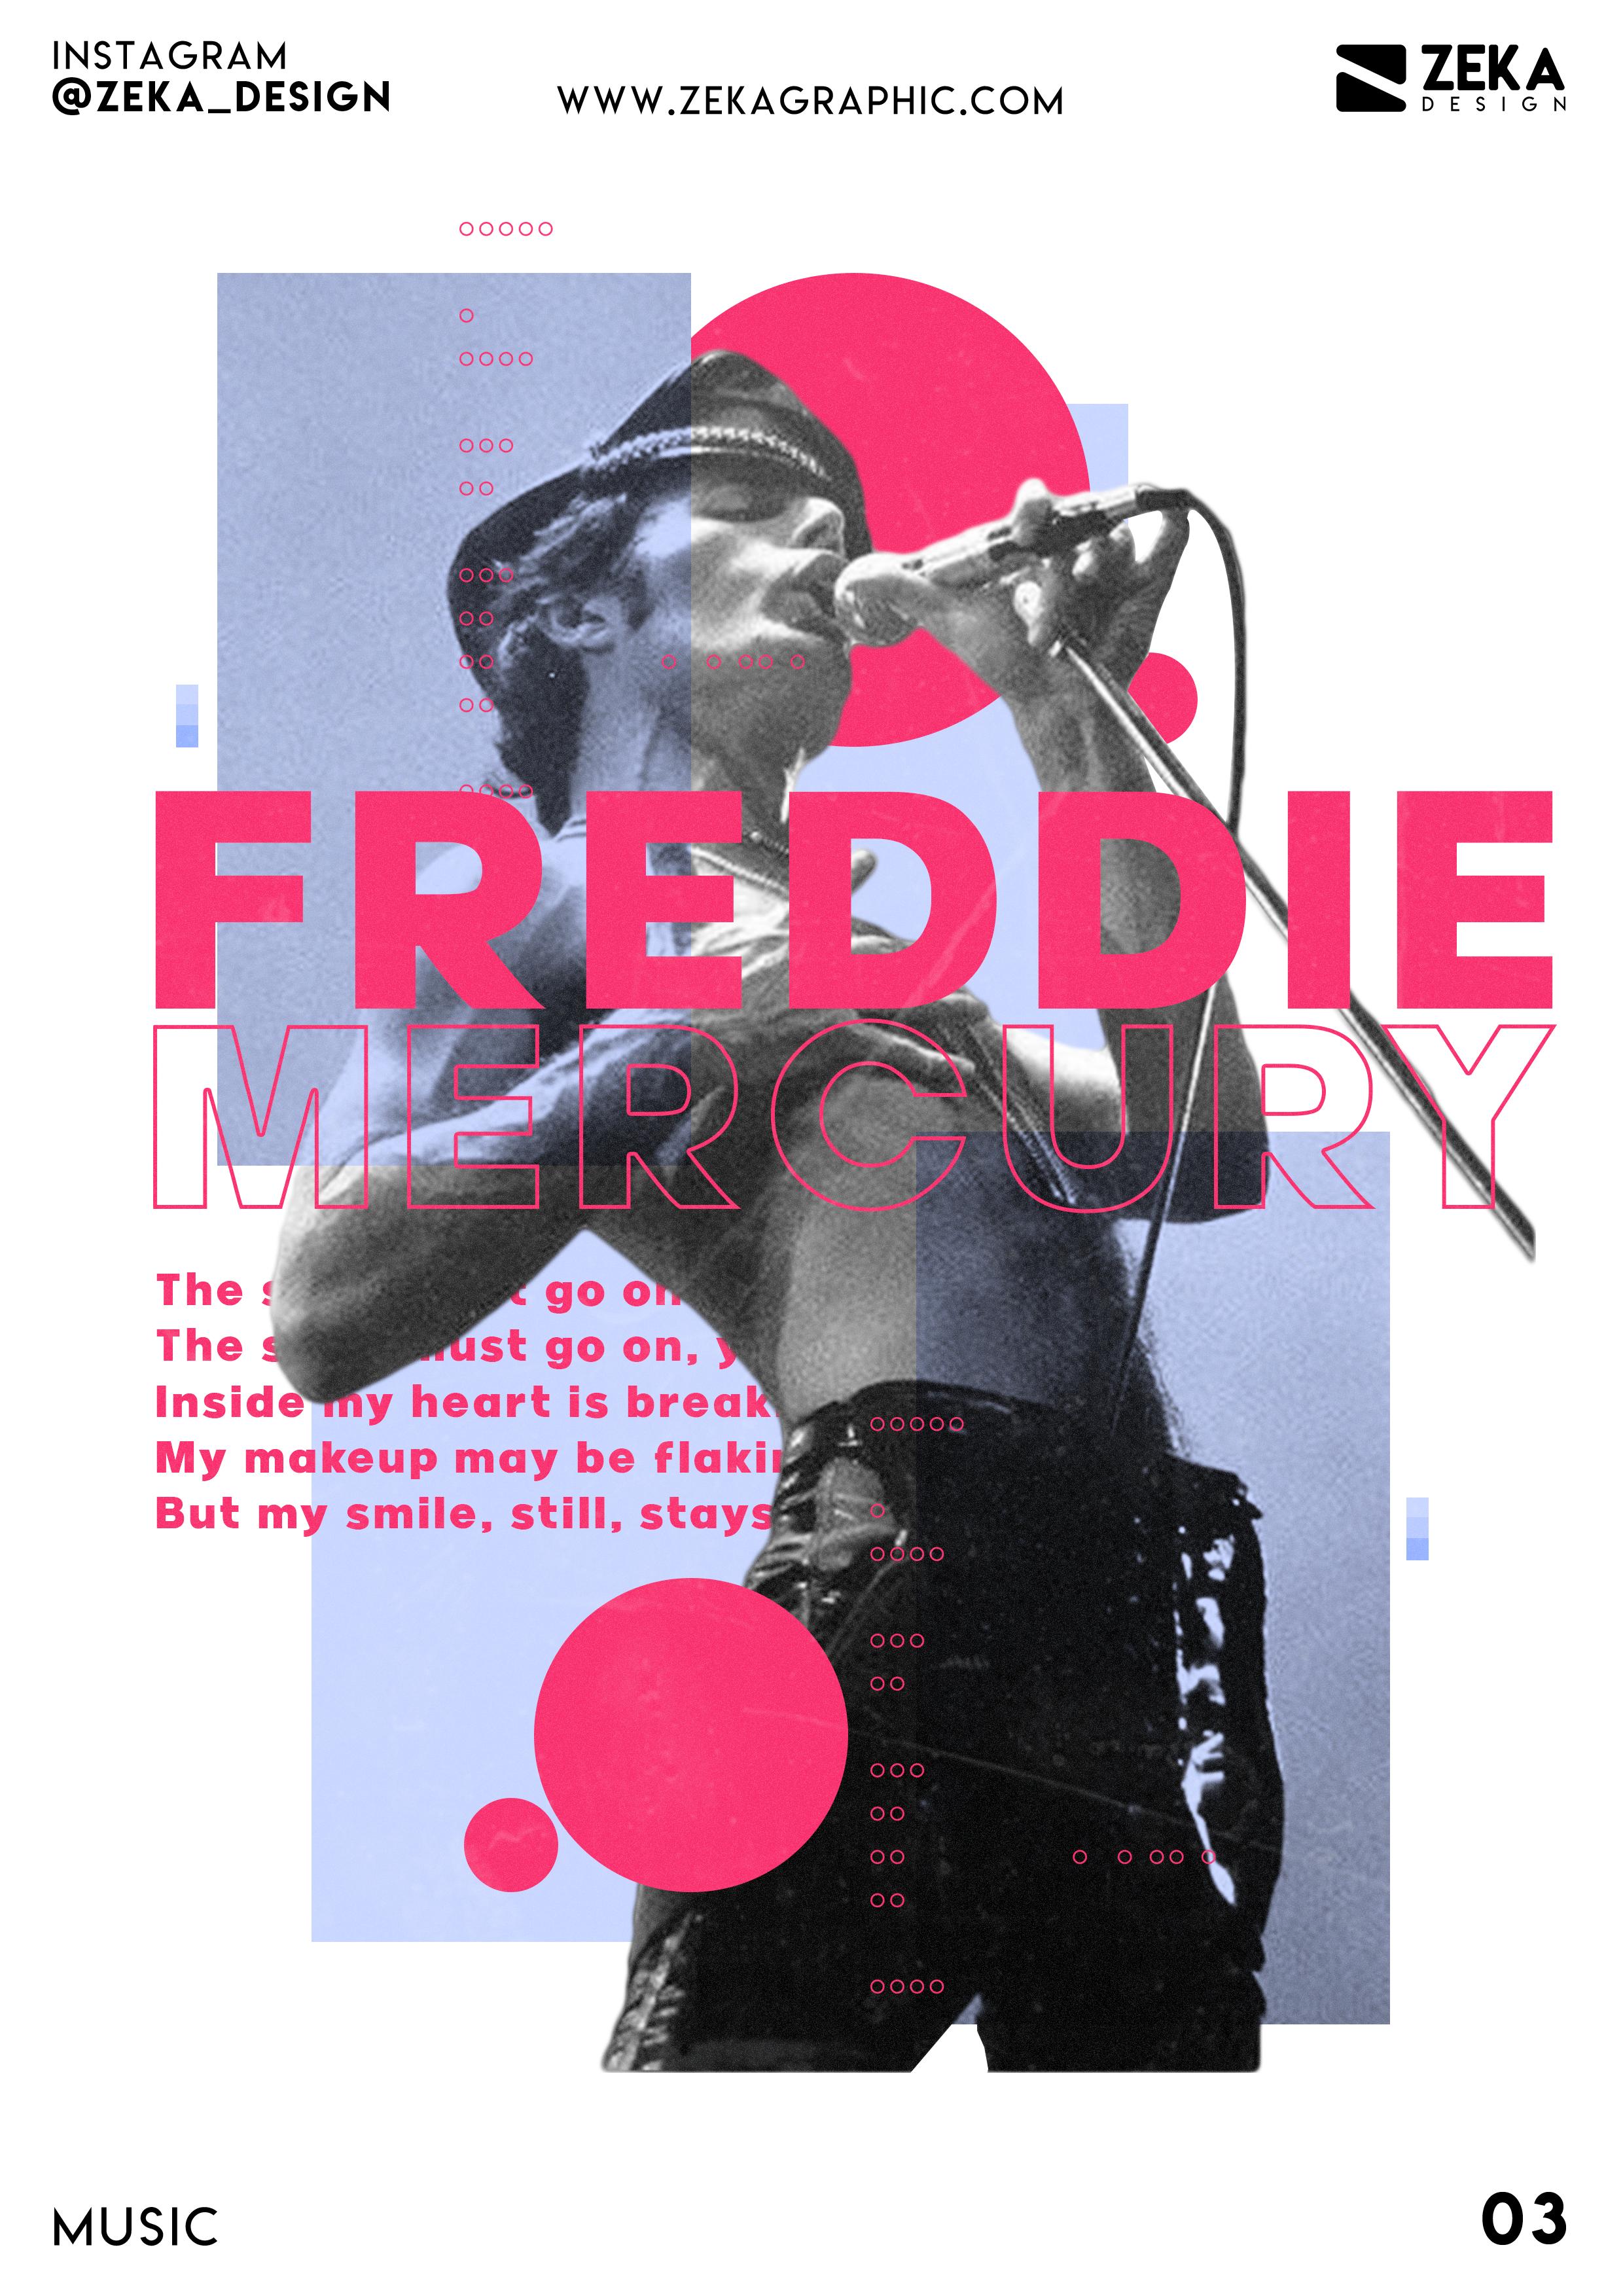 freddie mercury poster design music